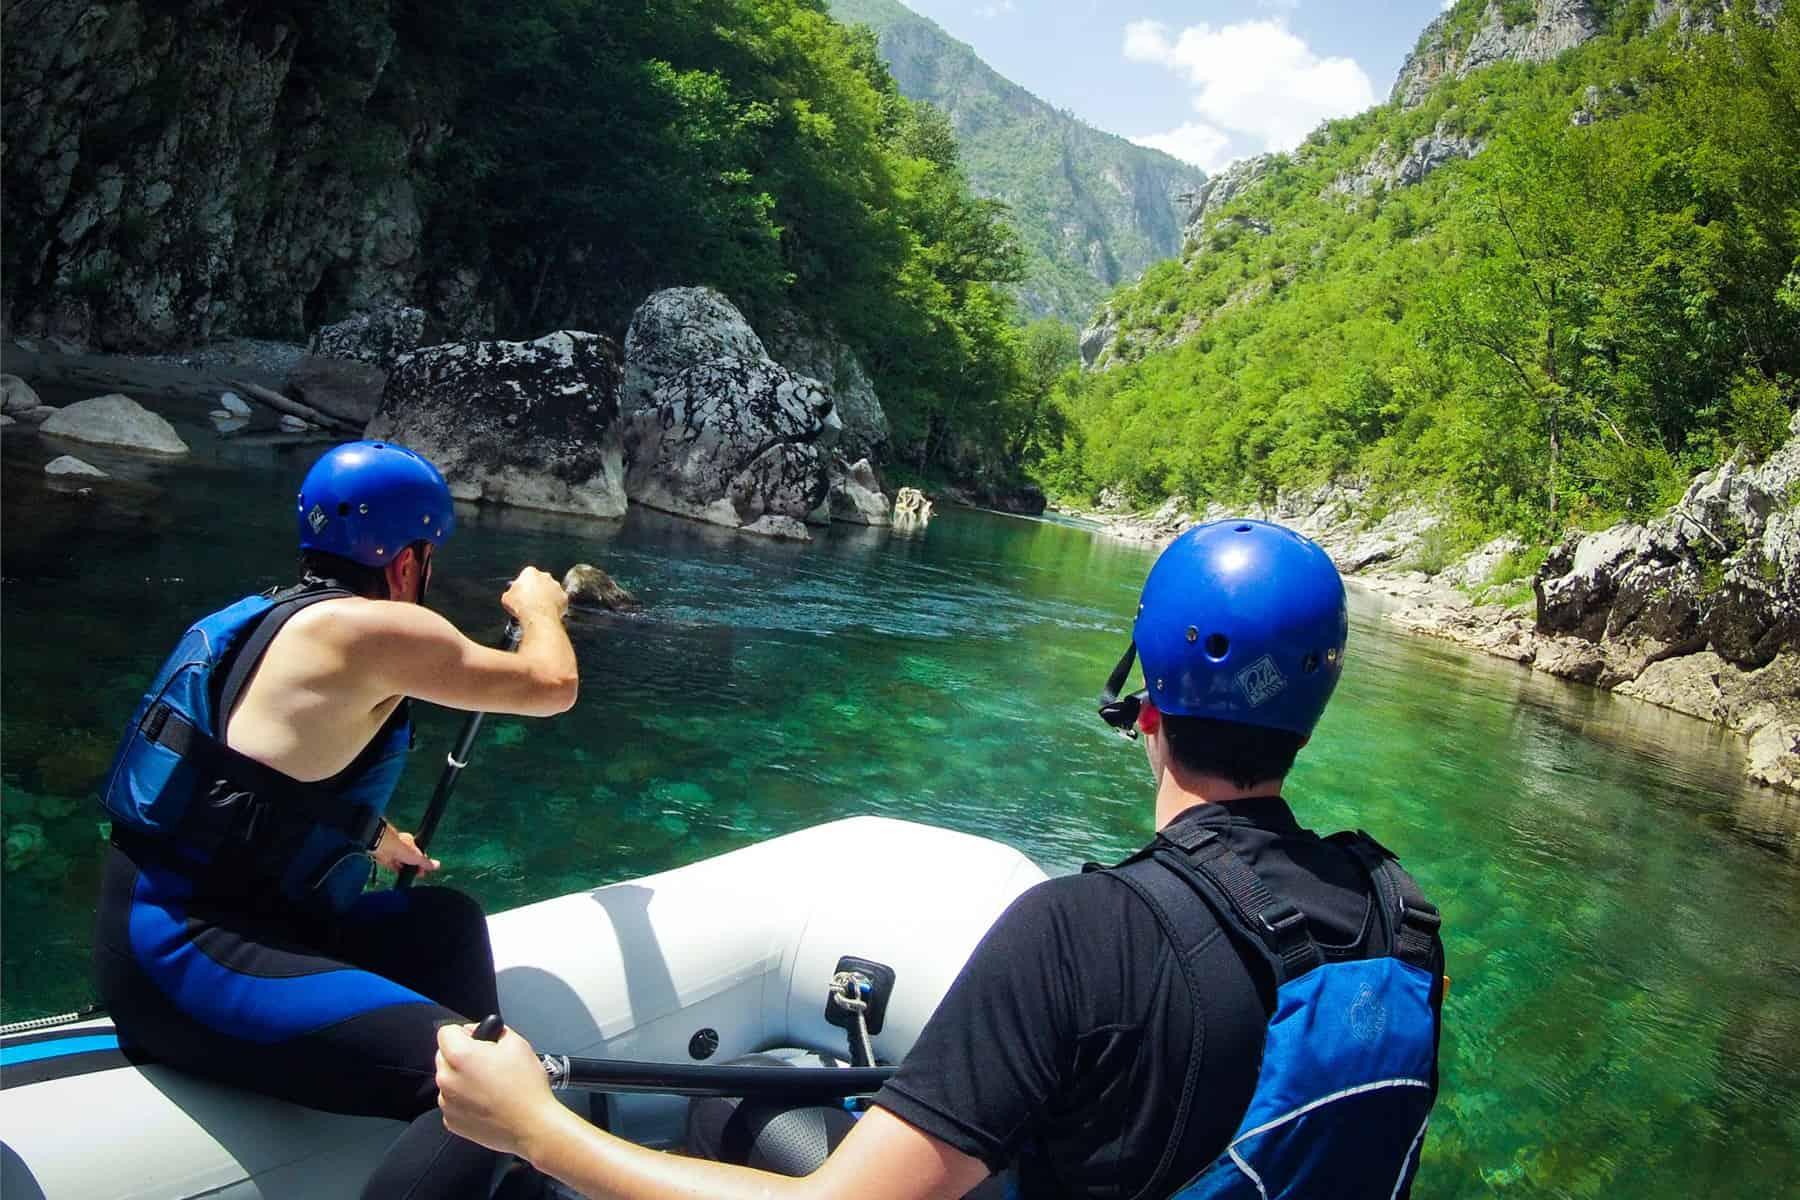 Rafting Scepan Polje Montenegro Adventure